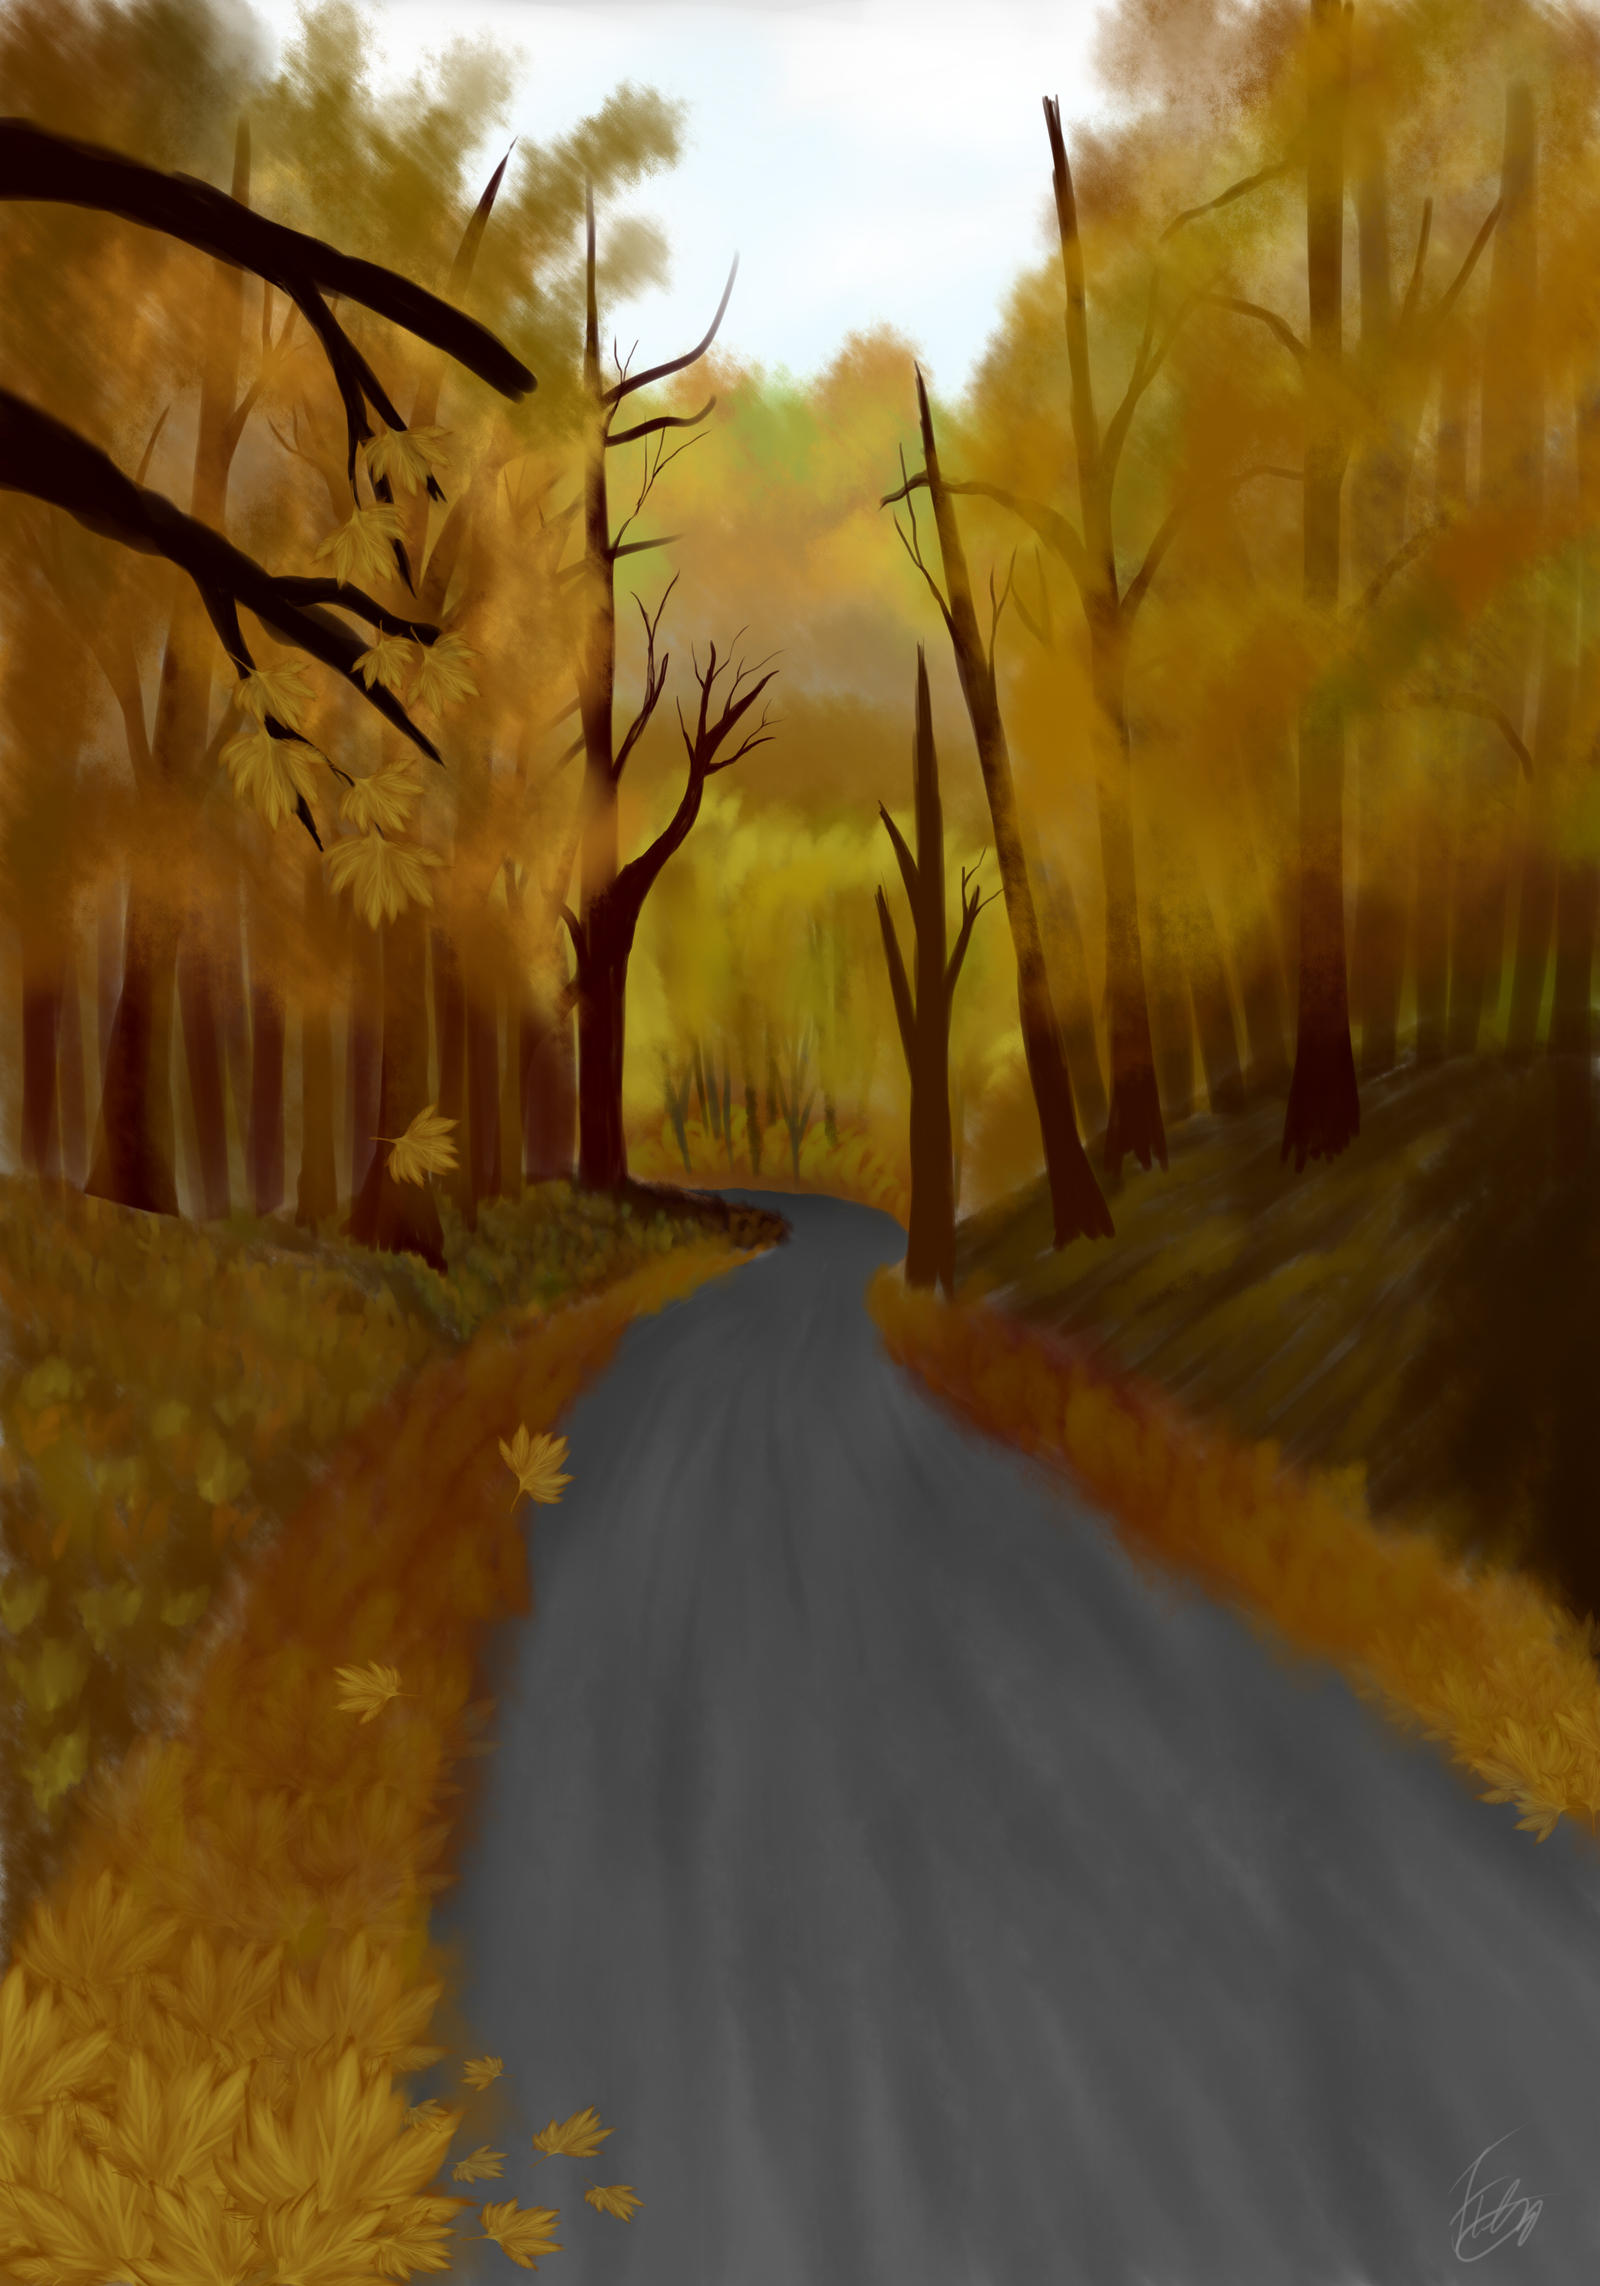 Autumn by ggeorgiev92